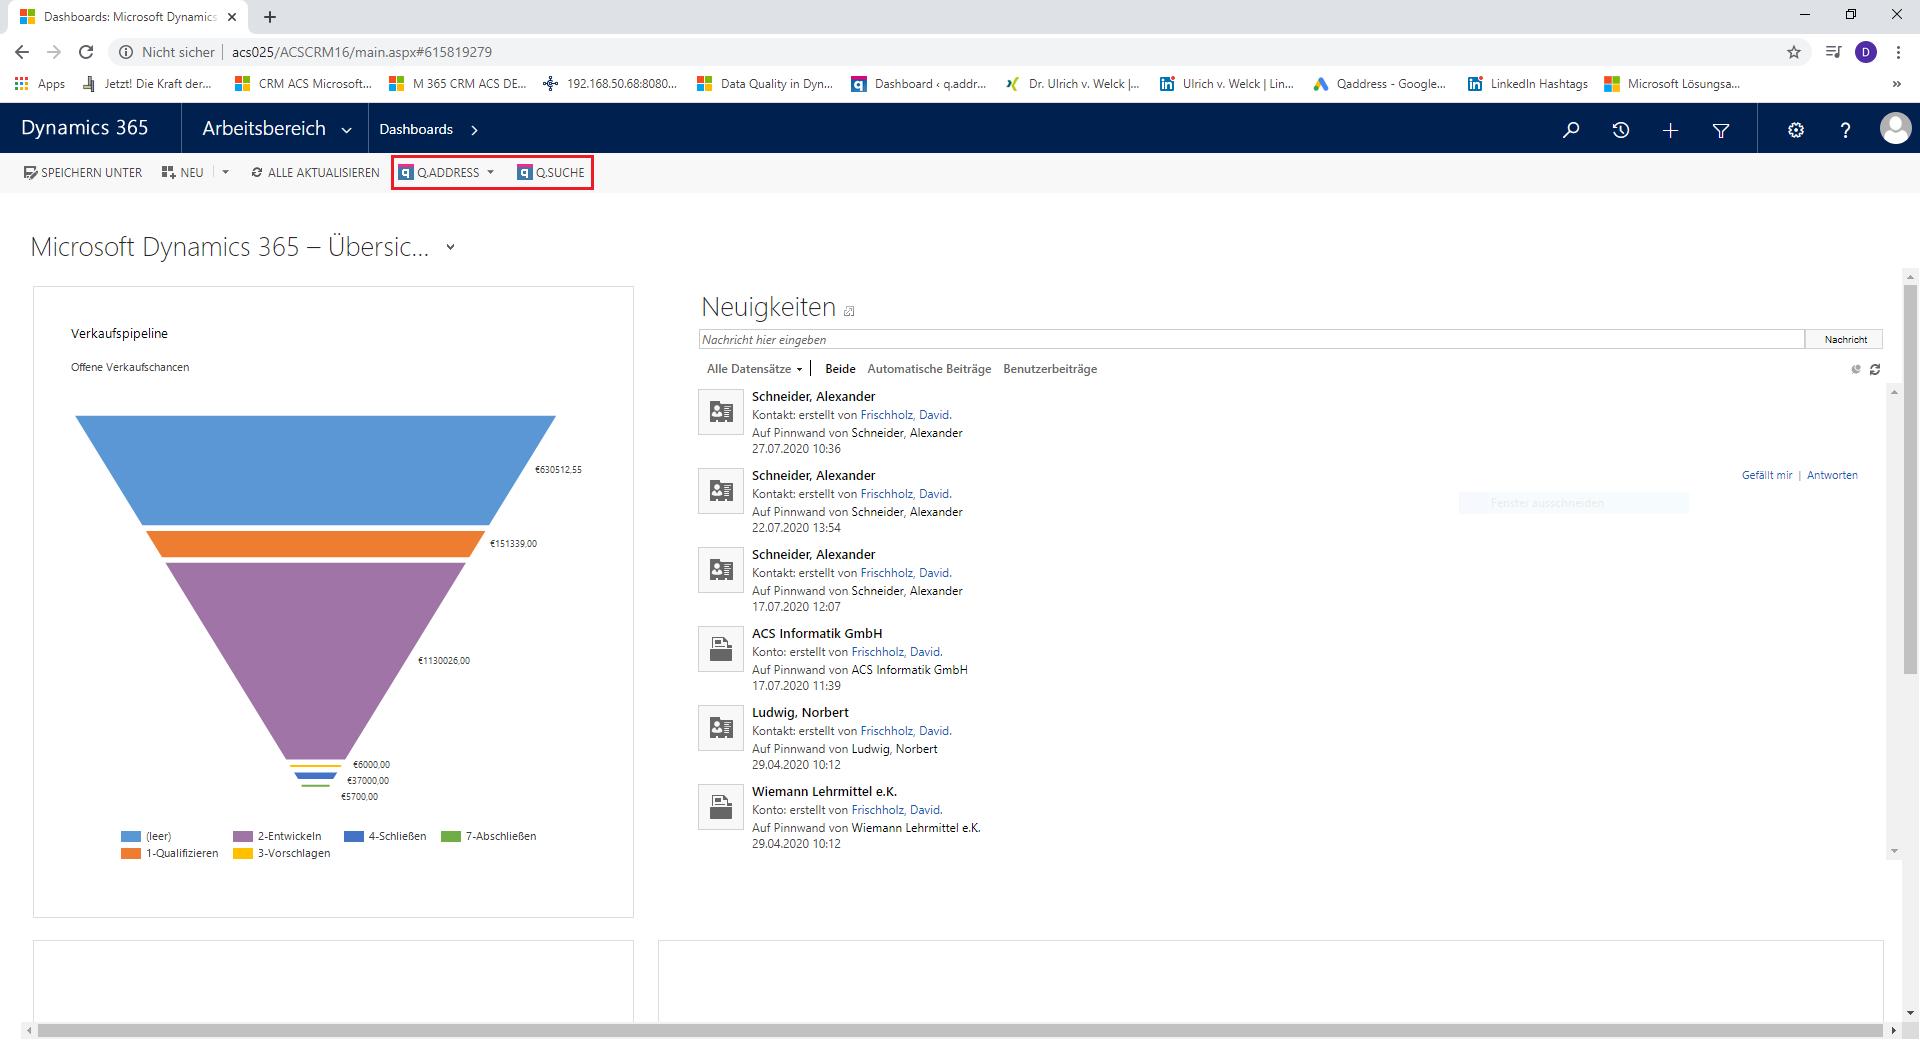 qaddress-Grundansicht-Microsoft-Dynamics-CRM